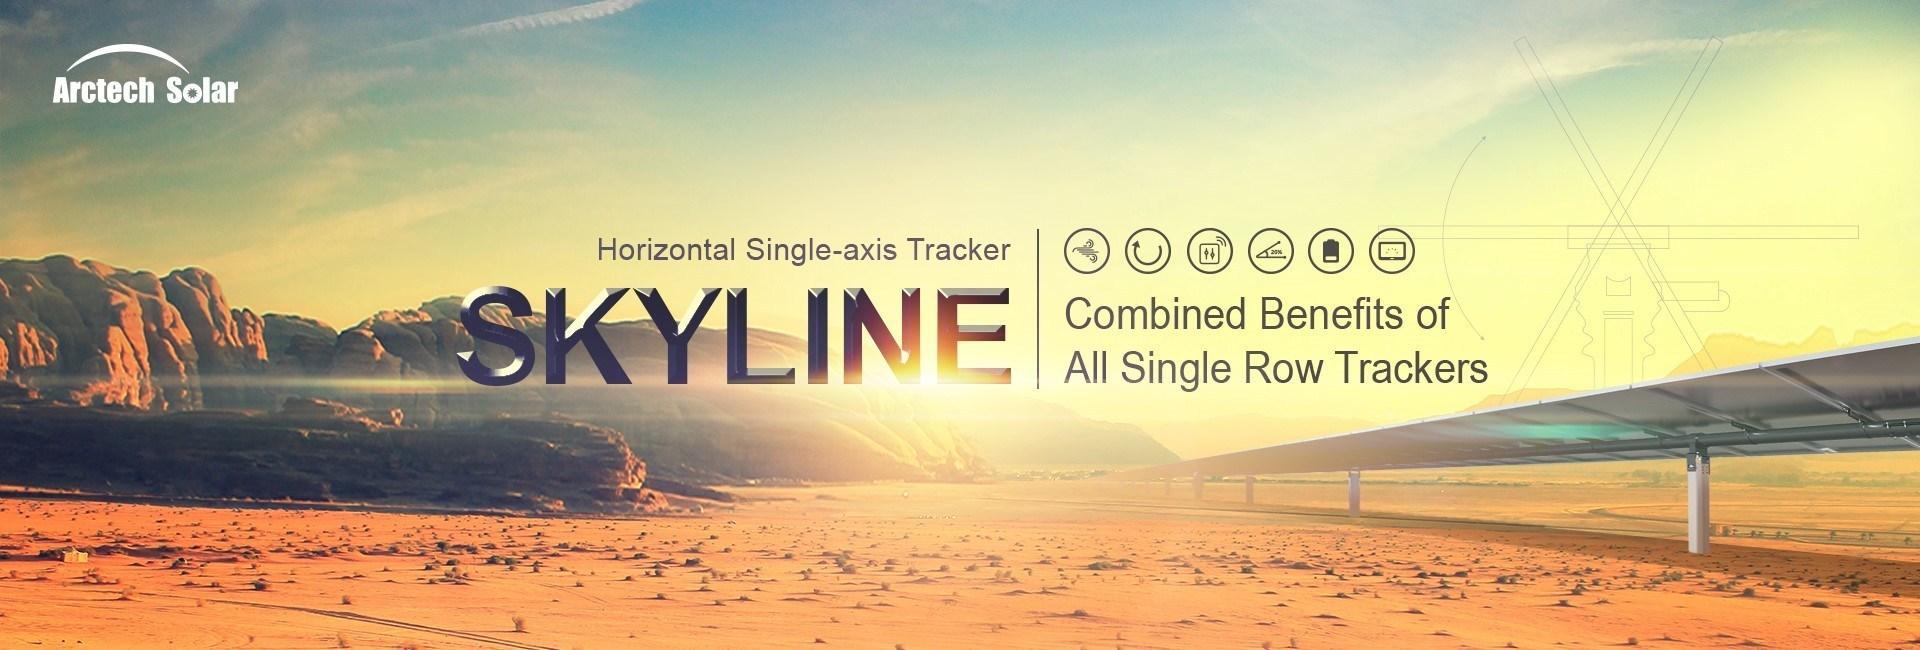 Arctech Solar's Skyline Tracking System